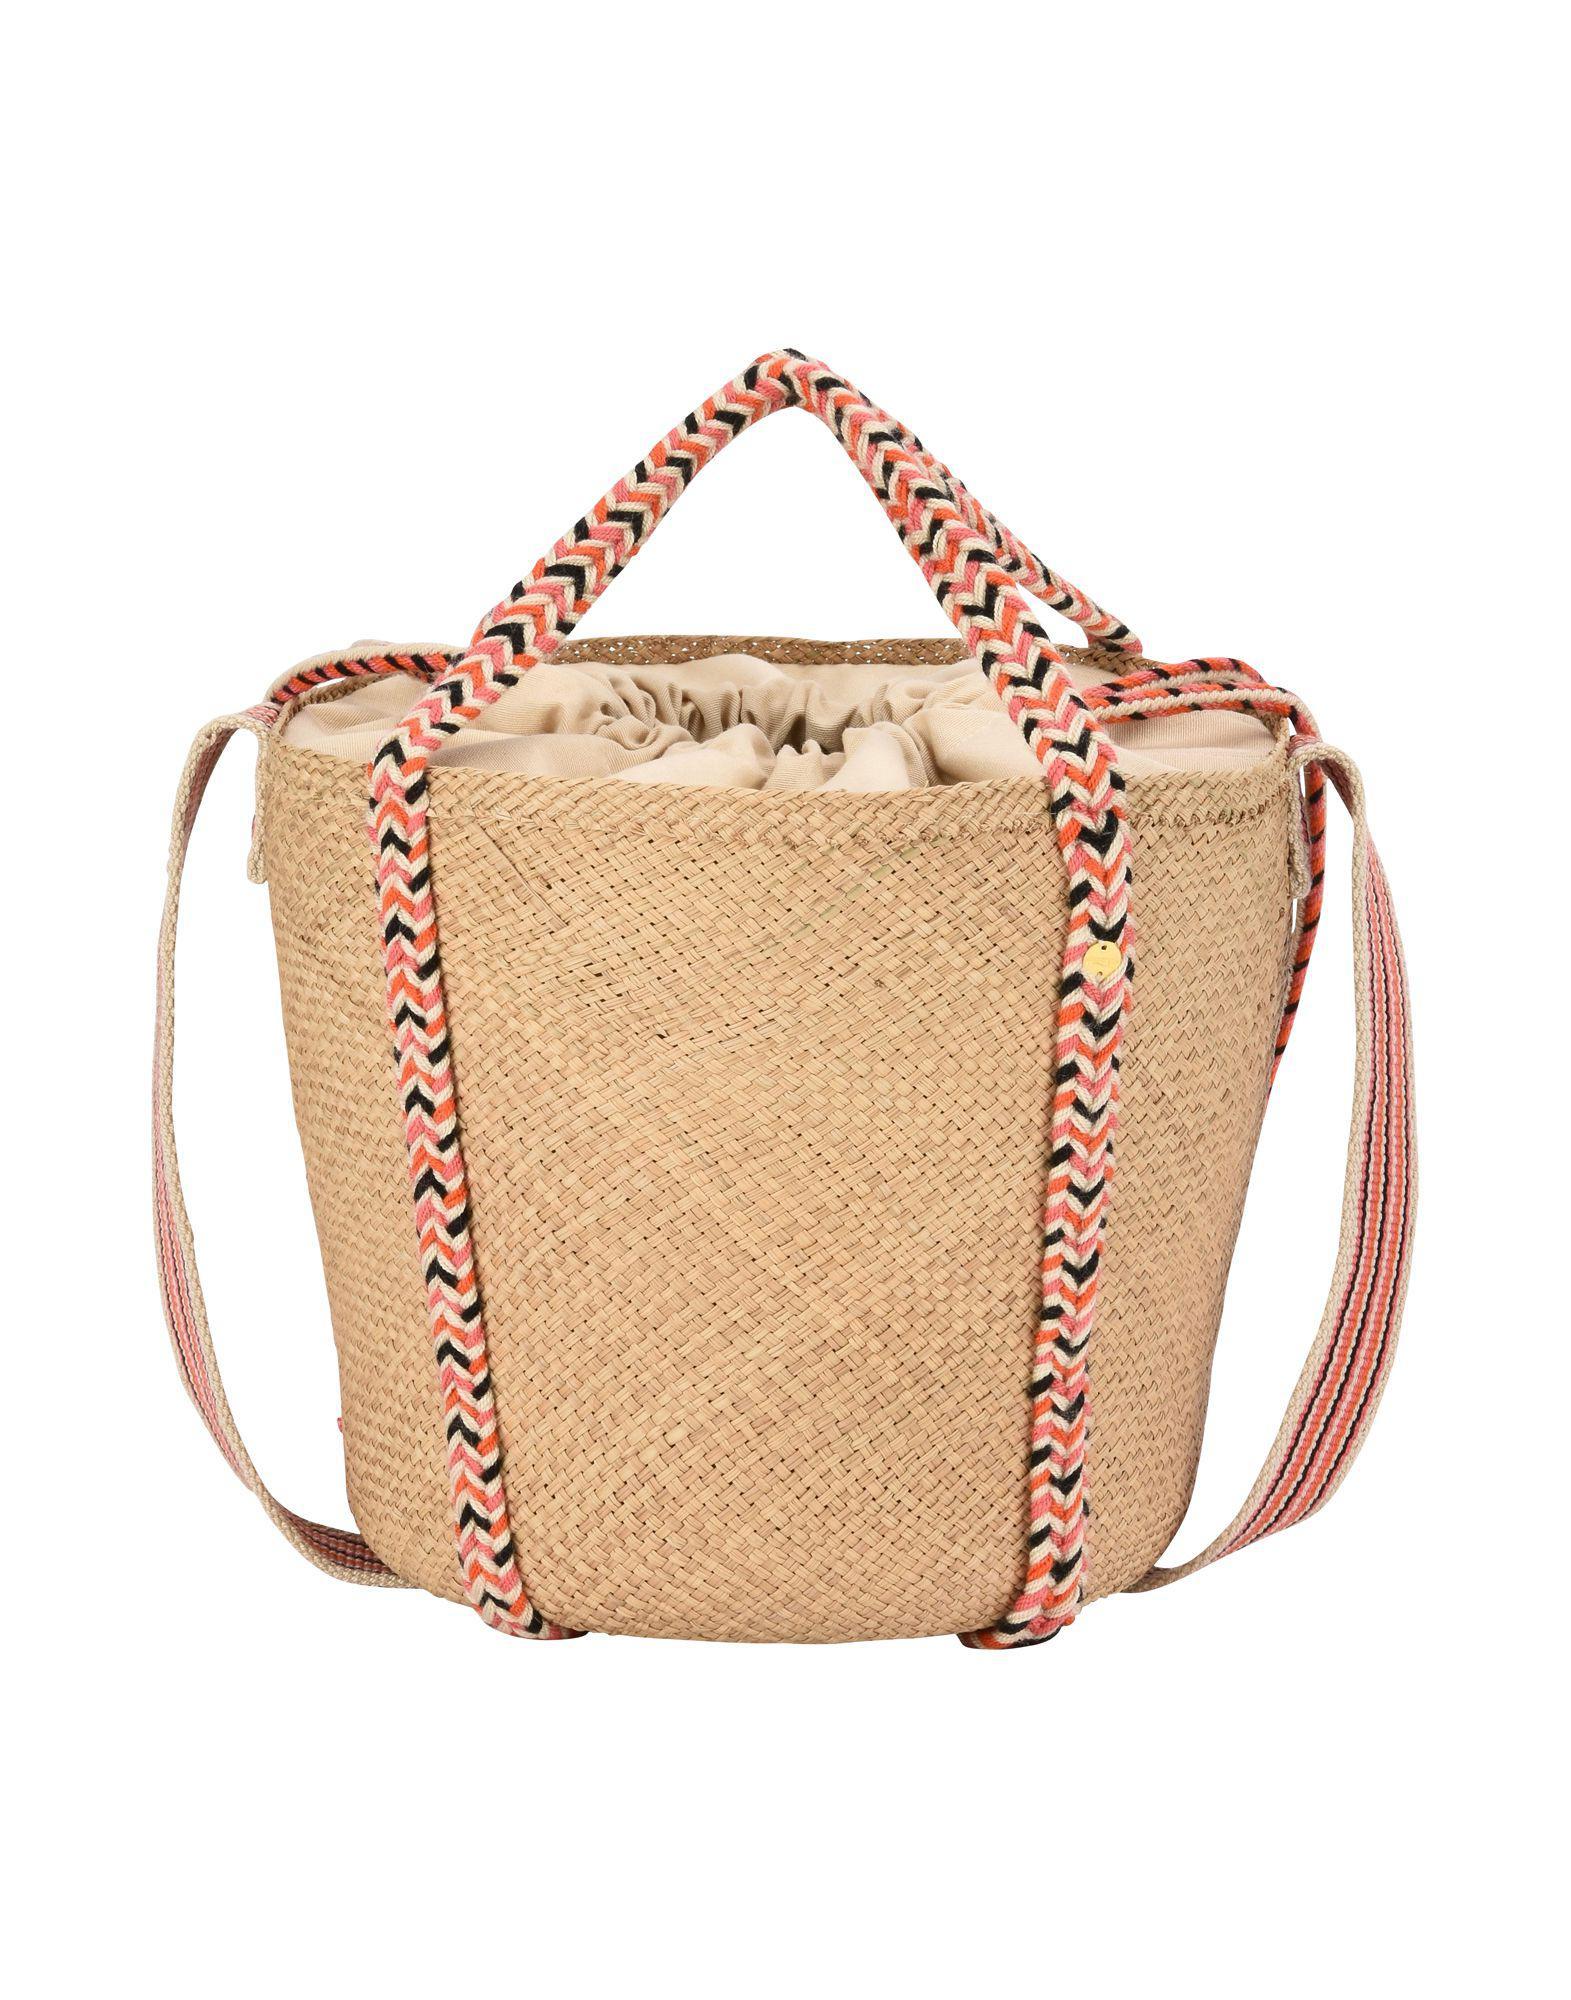 Guanabana Cross-body Bags in Beige (Natural)